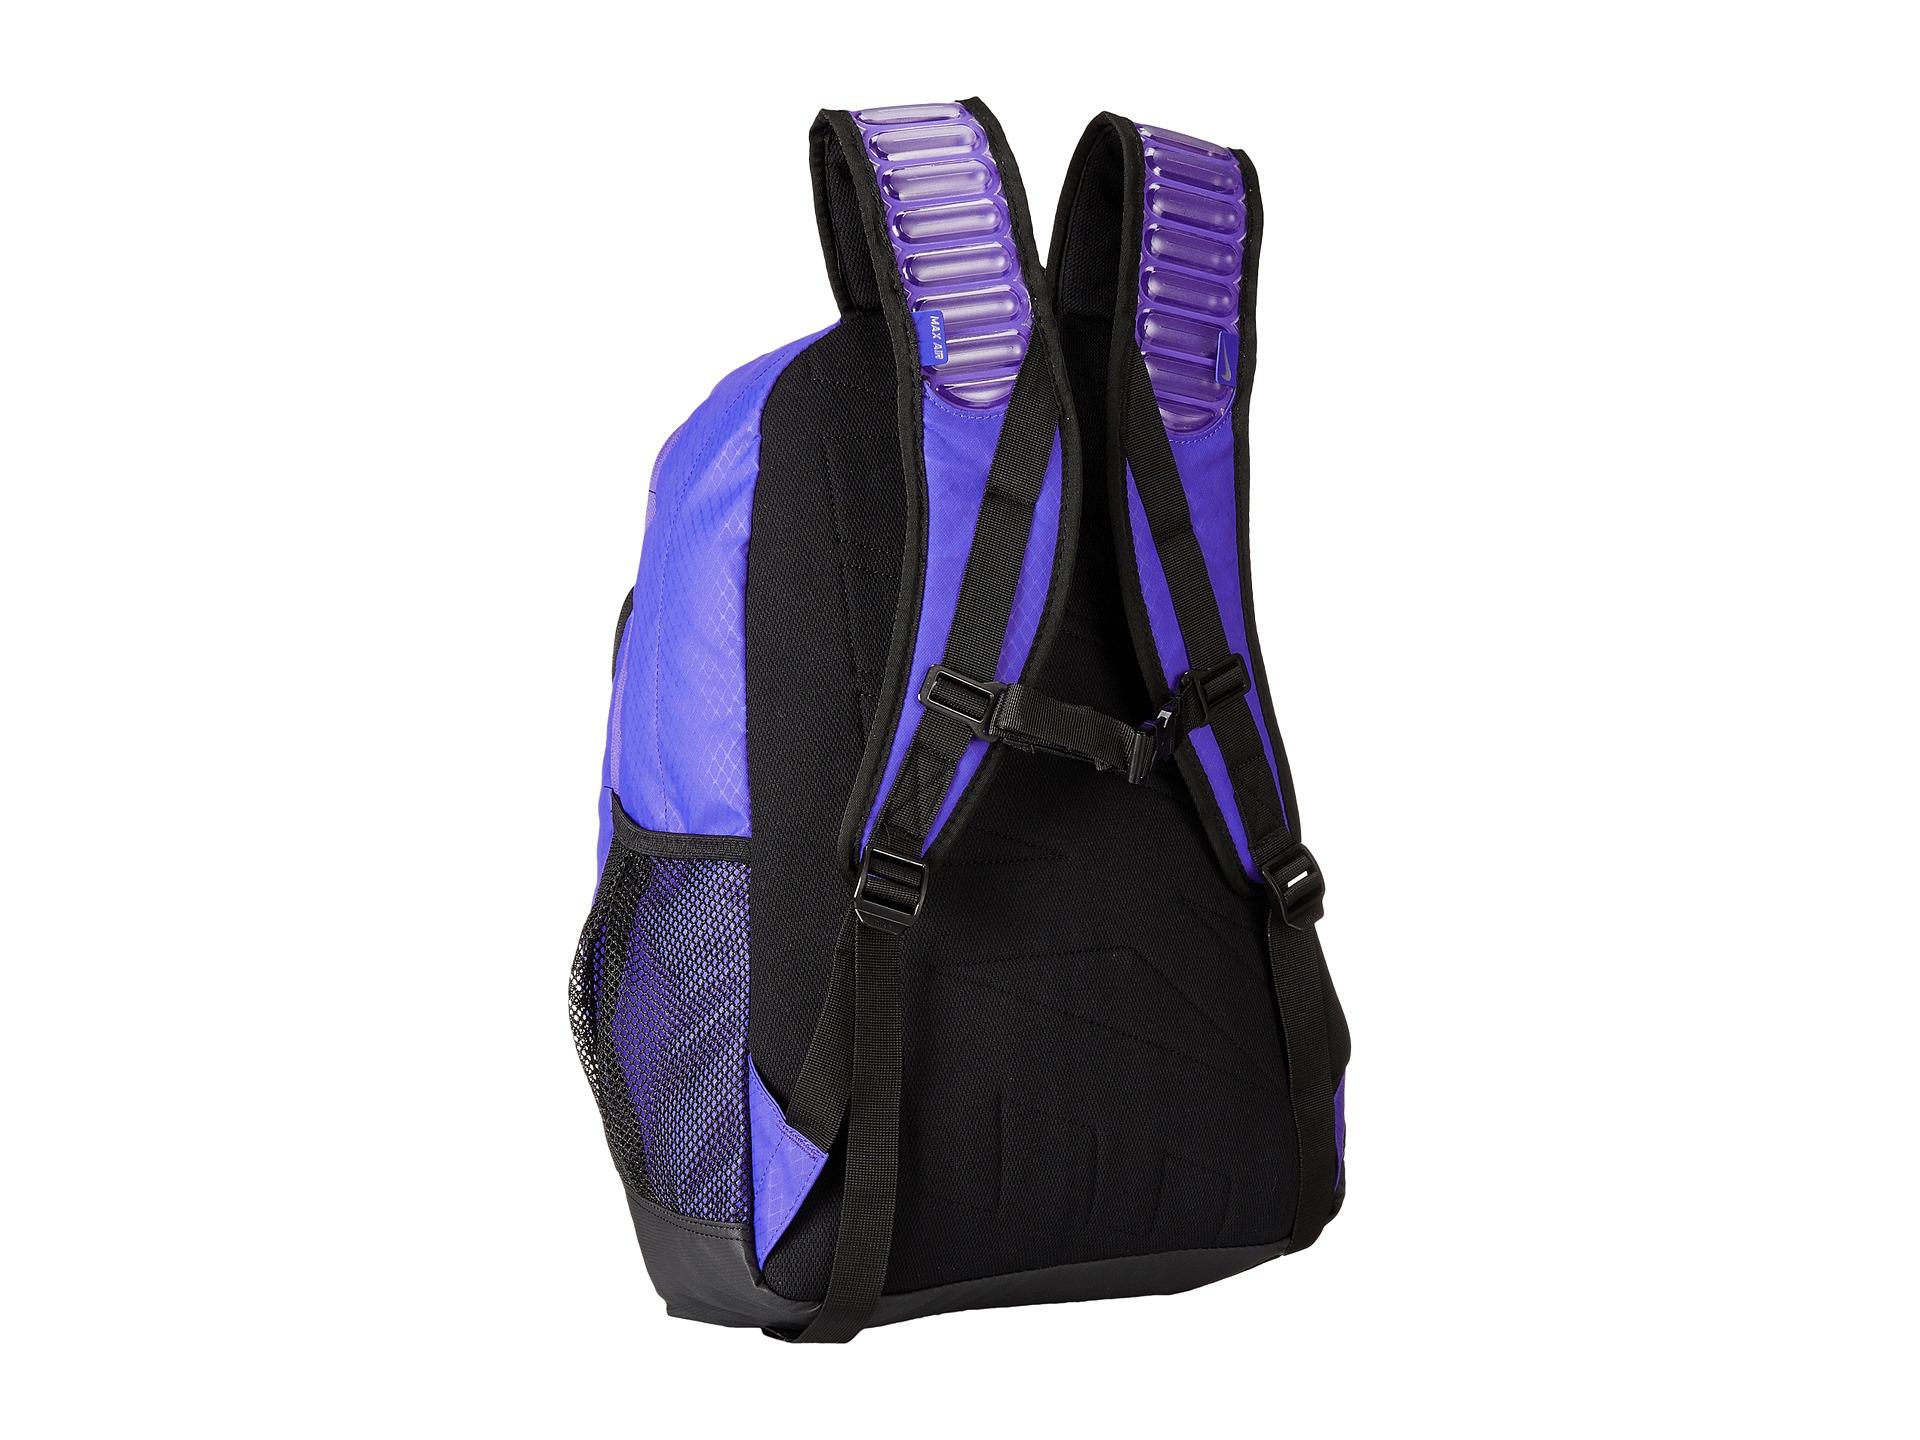 6b35797141 Lyst - Nike Max Air Vapor Backpack in Blue